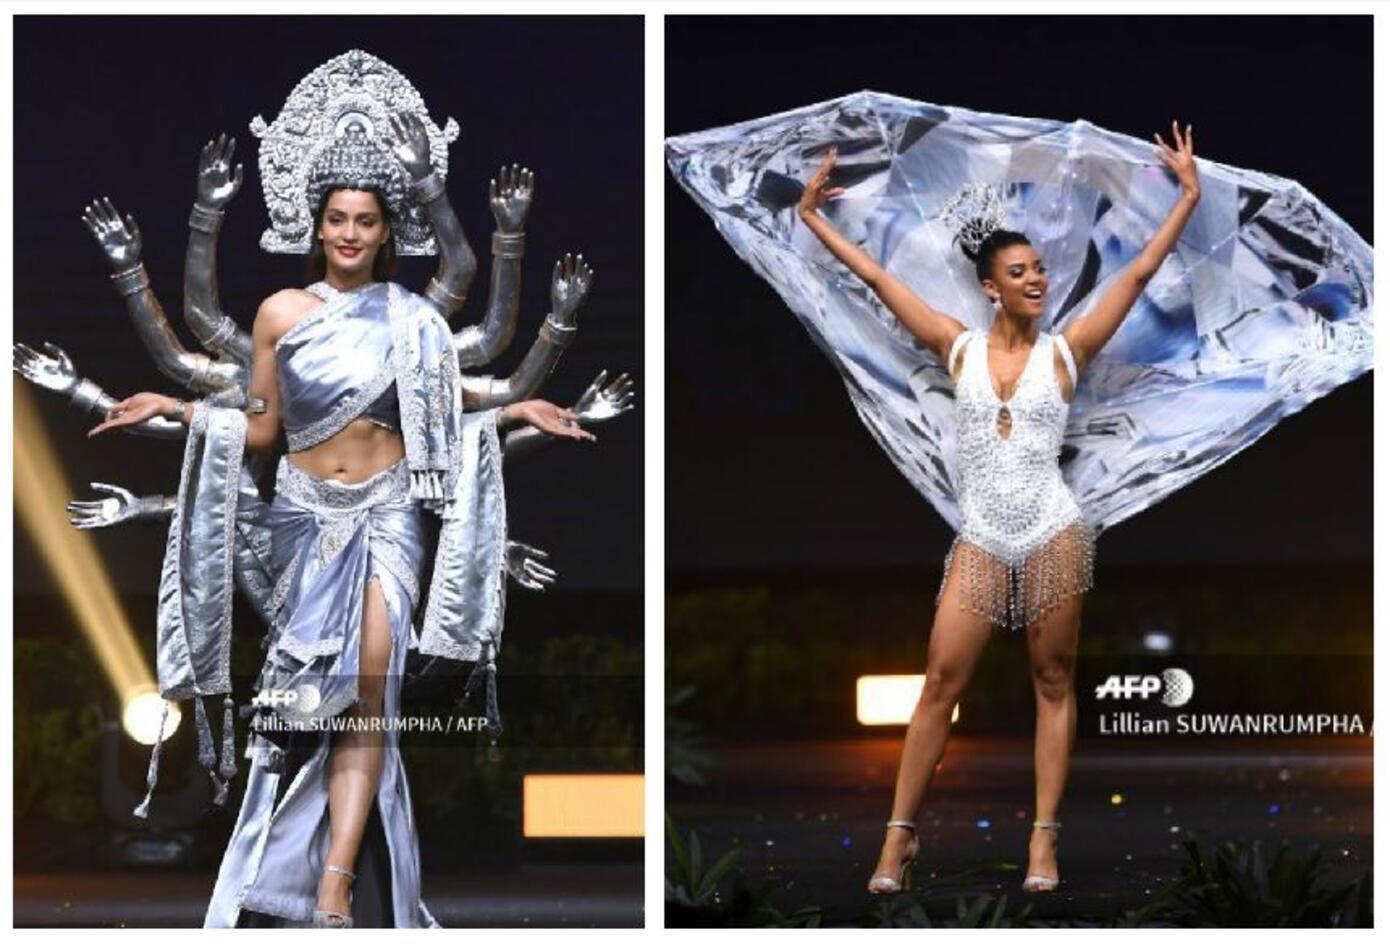 Trajes típicos de Miss Nepal y Miss Namibia